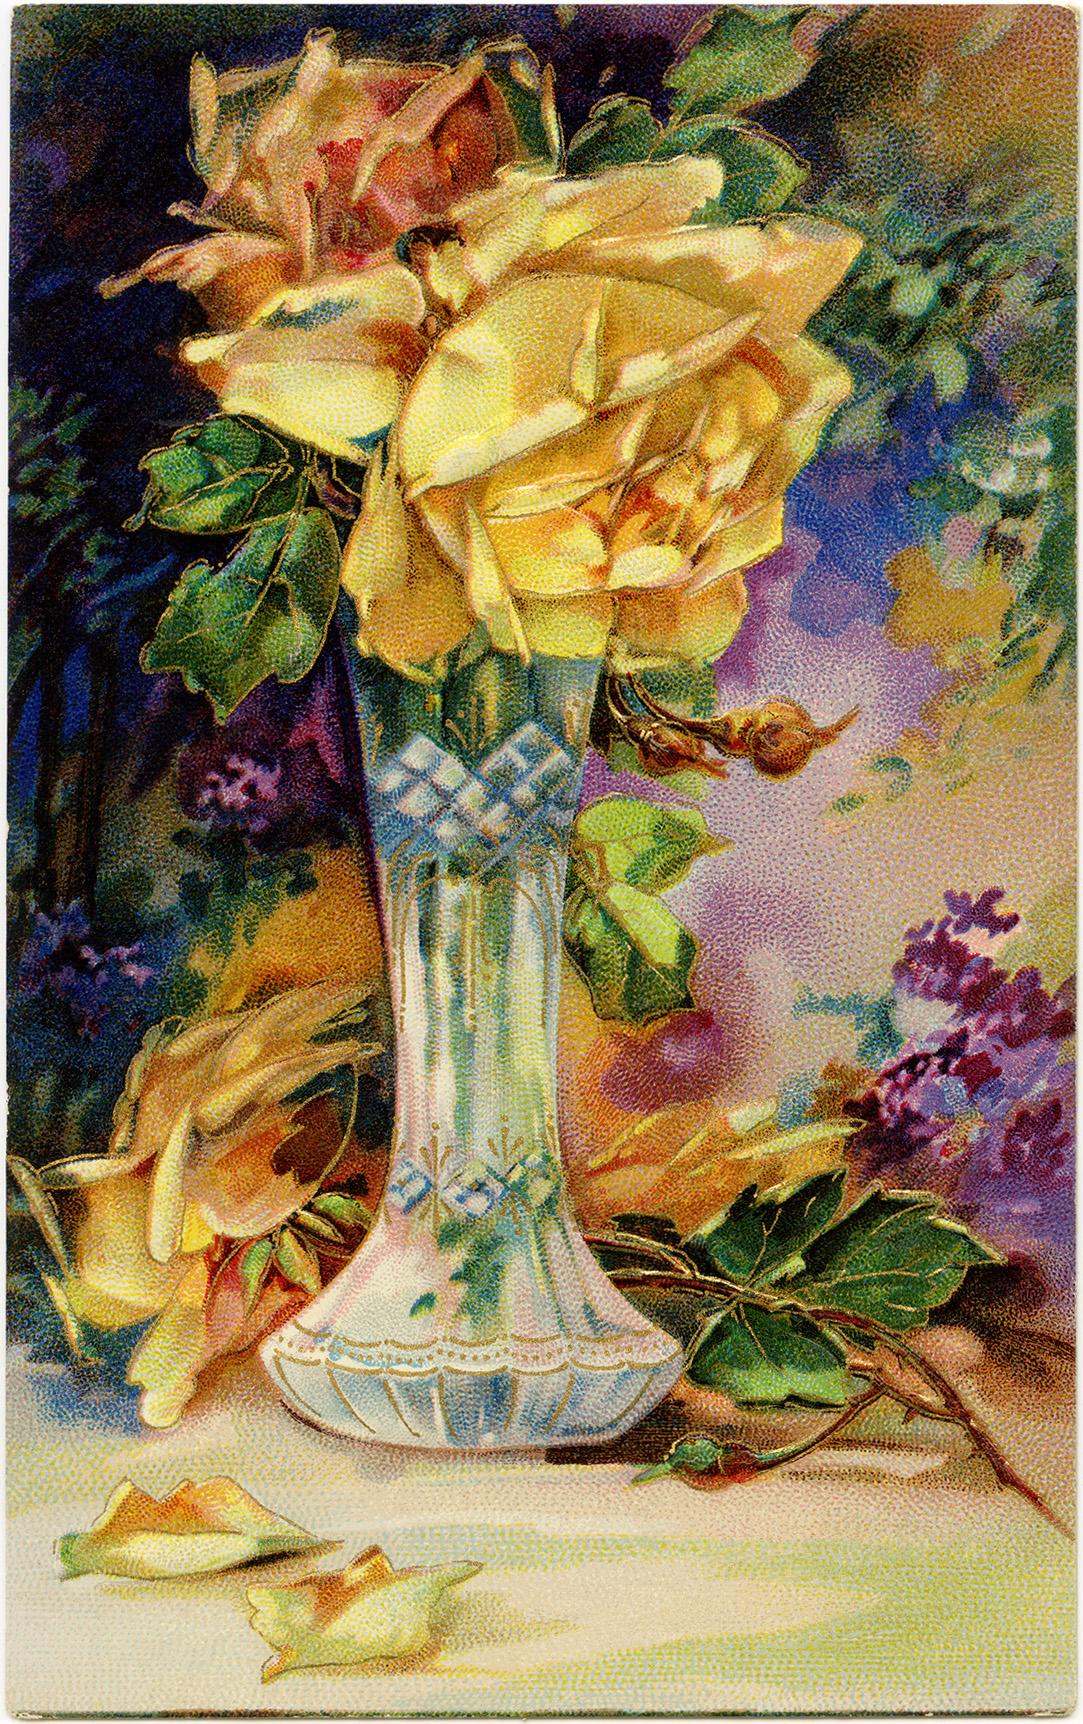 Yellow Rose Birthday Greetings ~ Vintage Image | Old ...